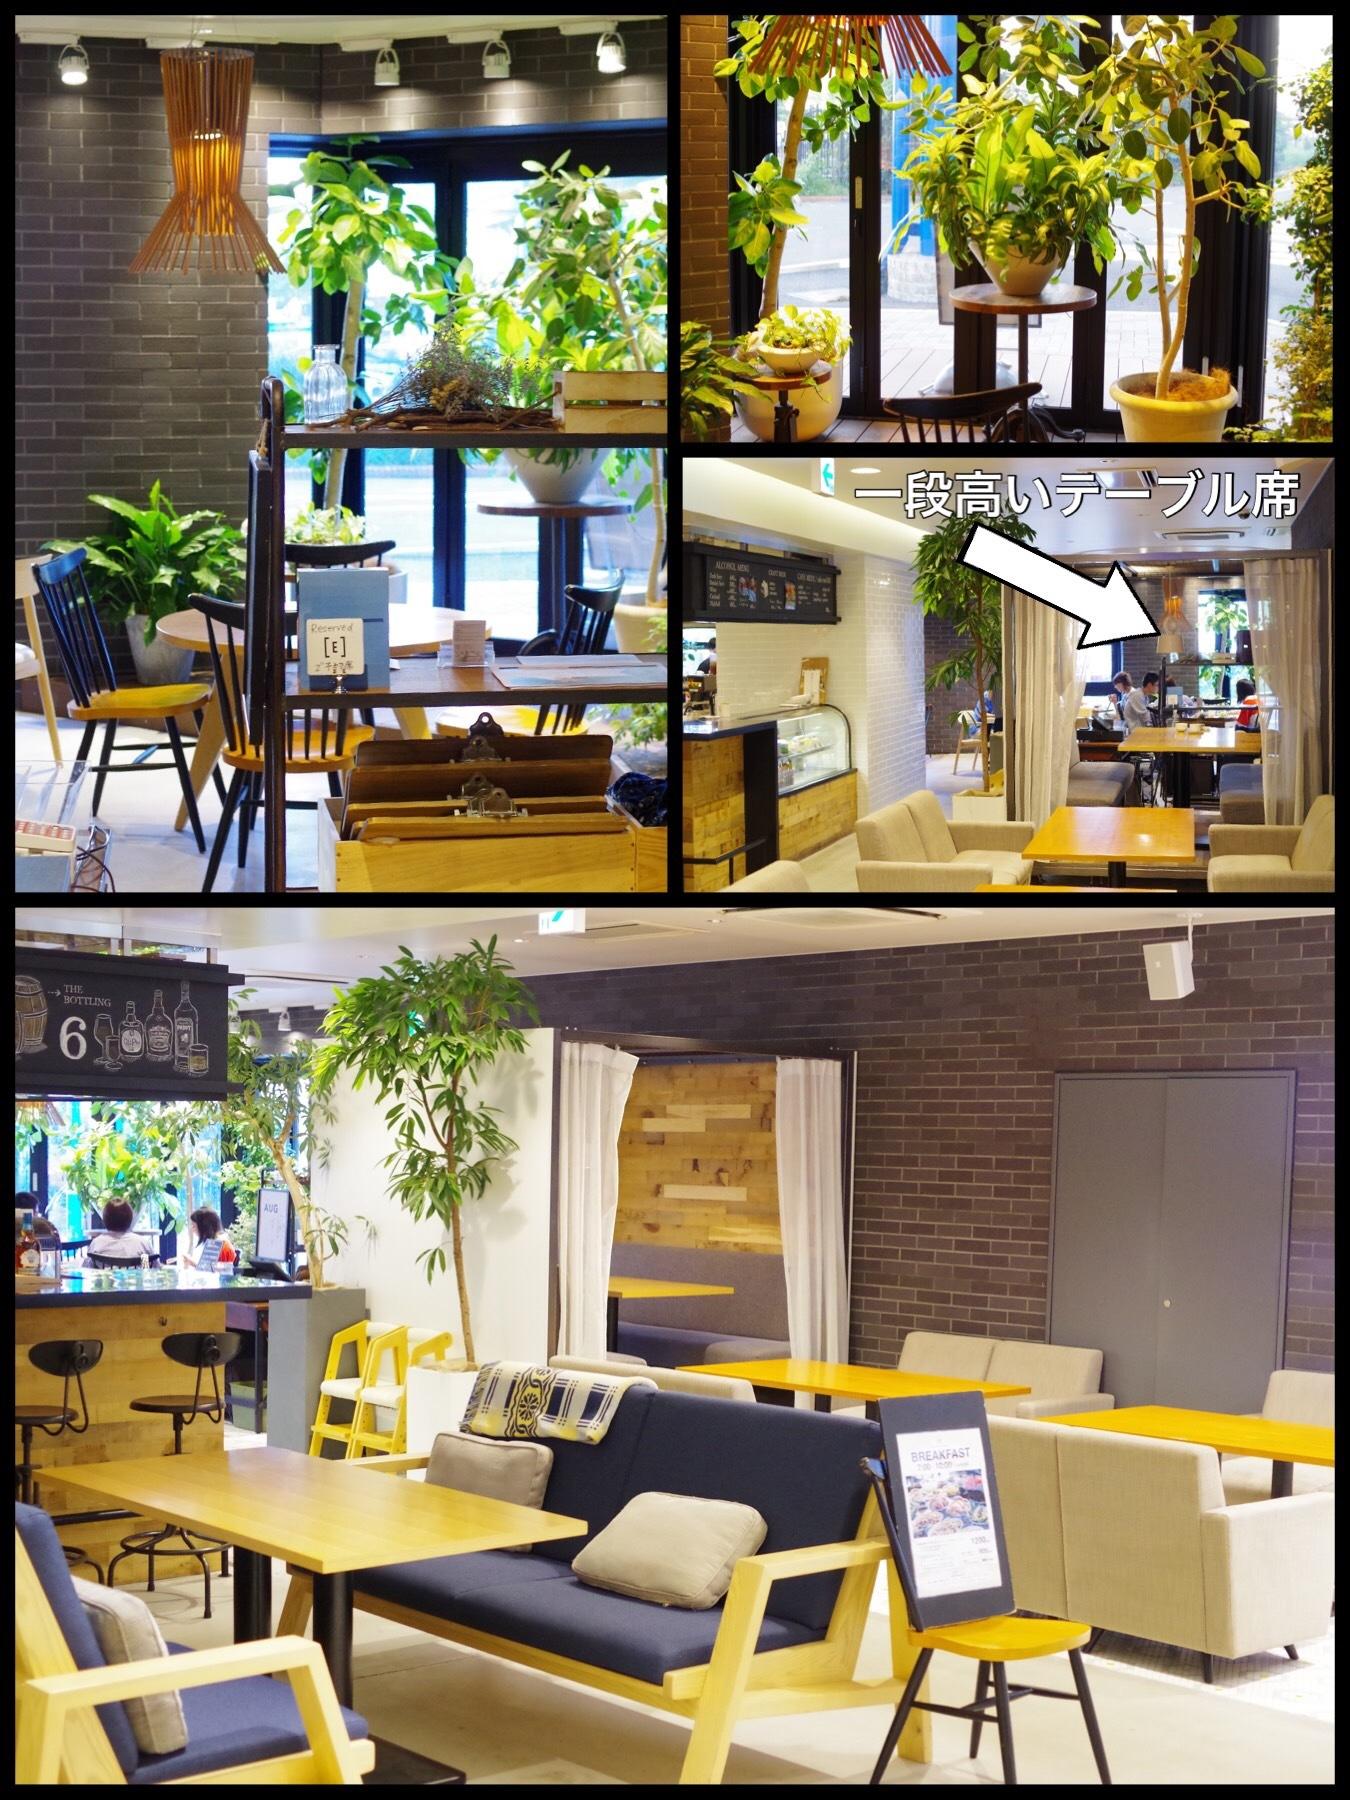 RAGOUT AND WHISKY HOUSE「ラグーアンドウイスキーハウス」ホ テル エディット横濱 朝食ビュッフェ